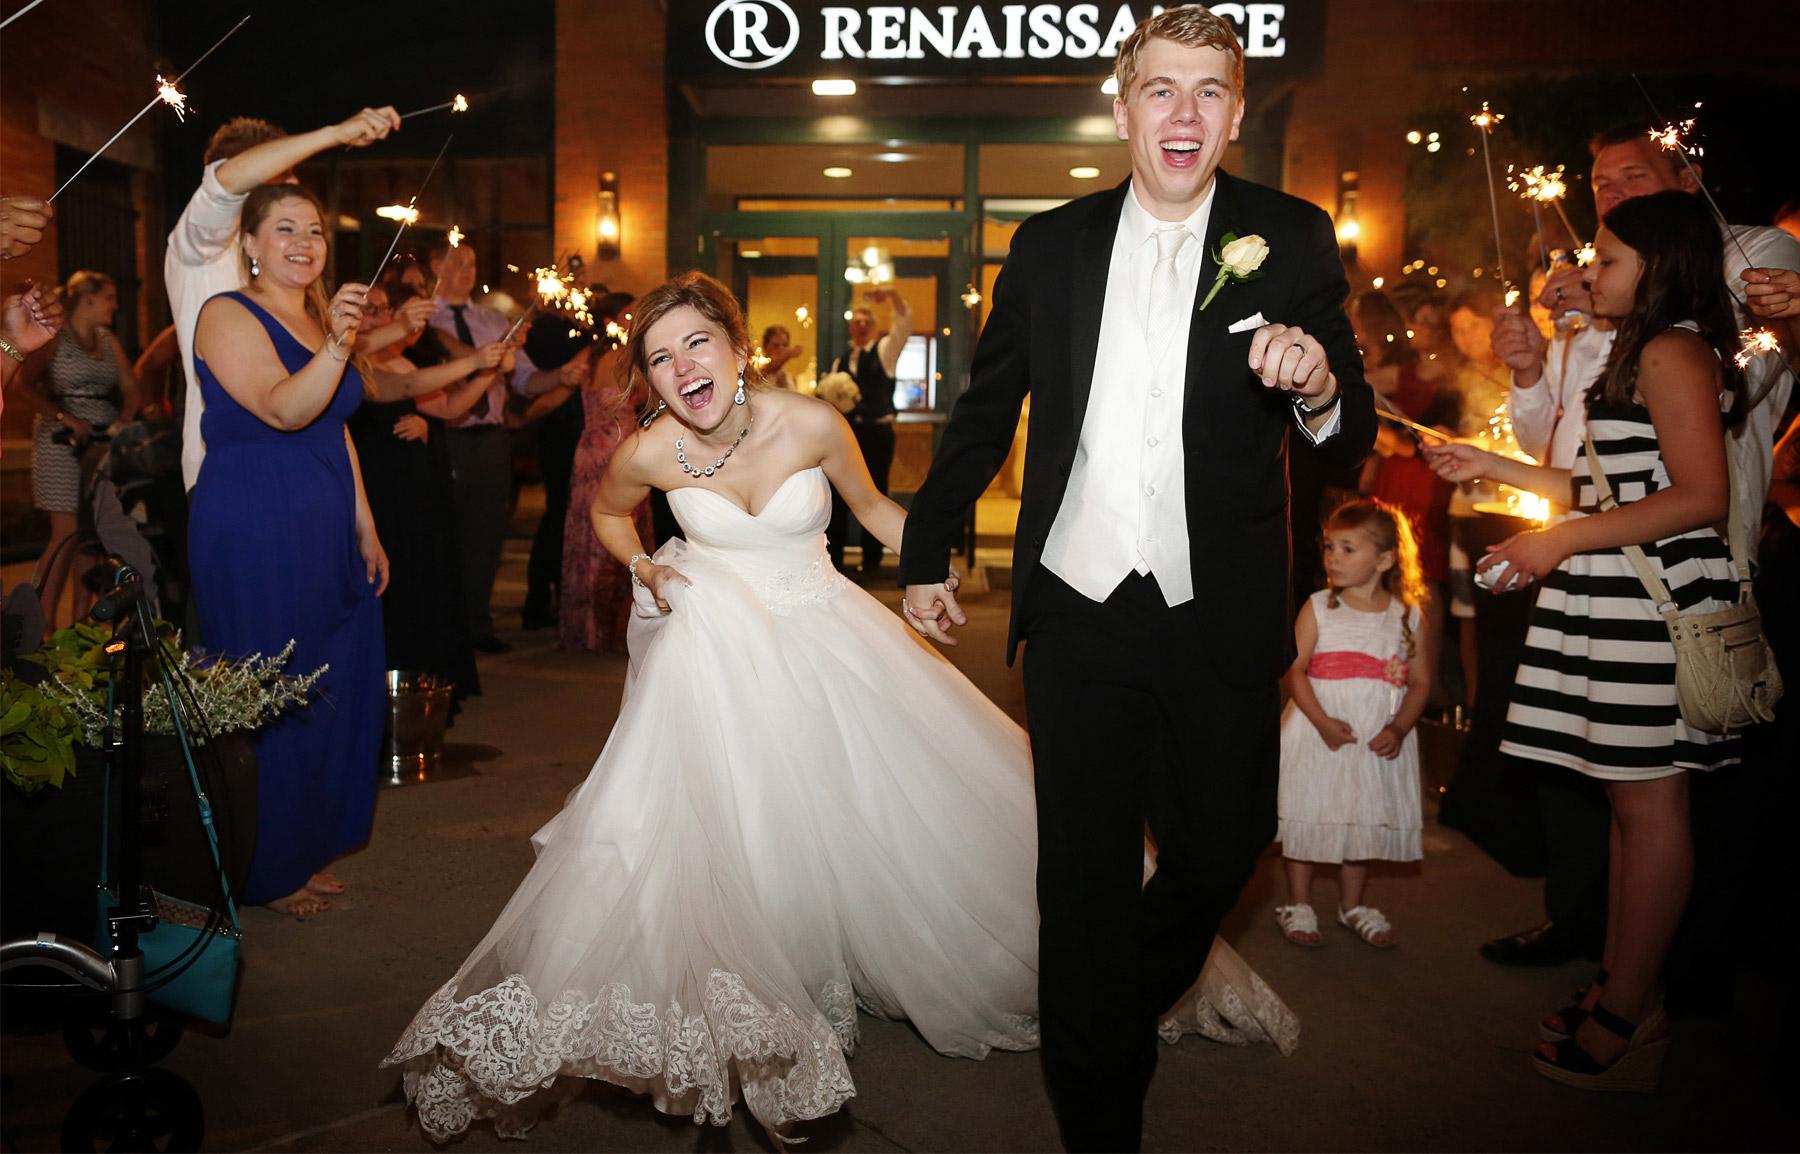 17-Minneapolis-Minnesota-Wedding-Photography-by-Vick-Photography-The-Depot-Reception-Courtney-&-John.jpg